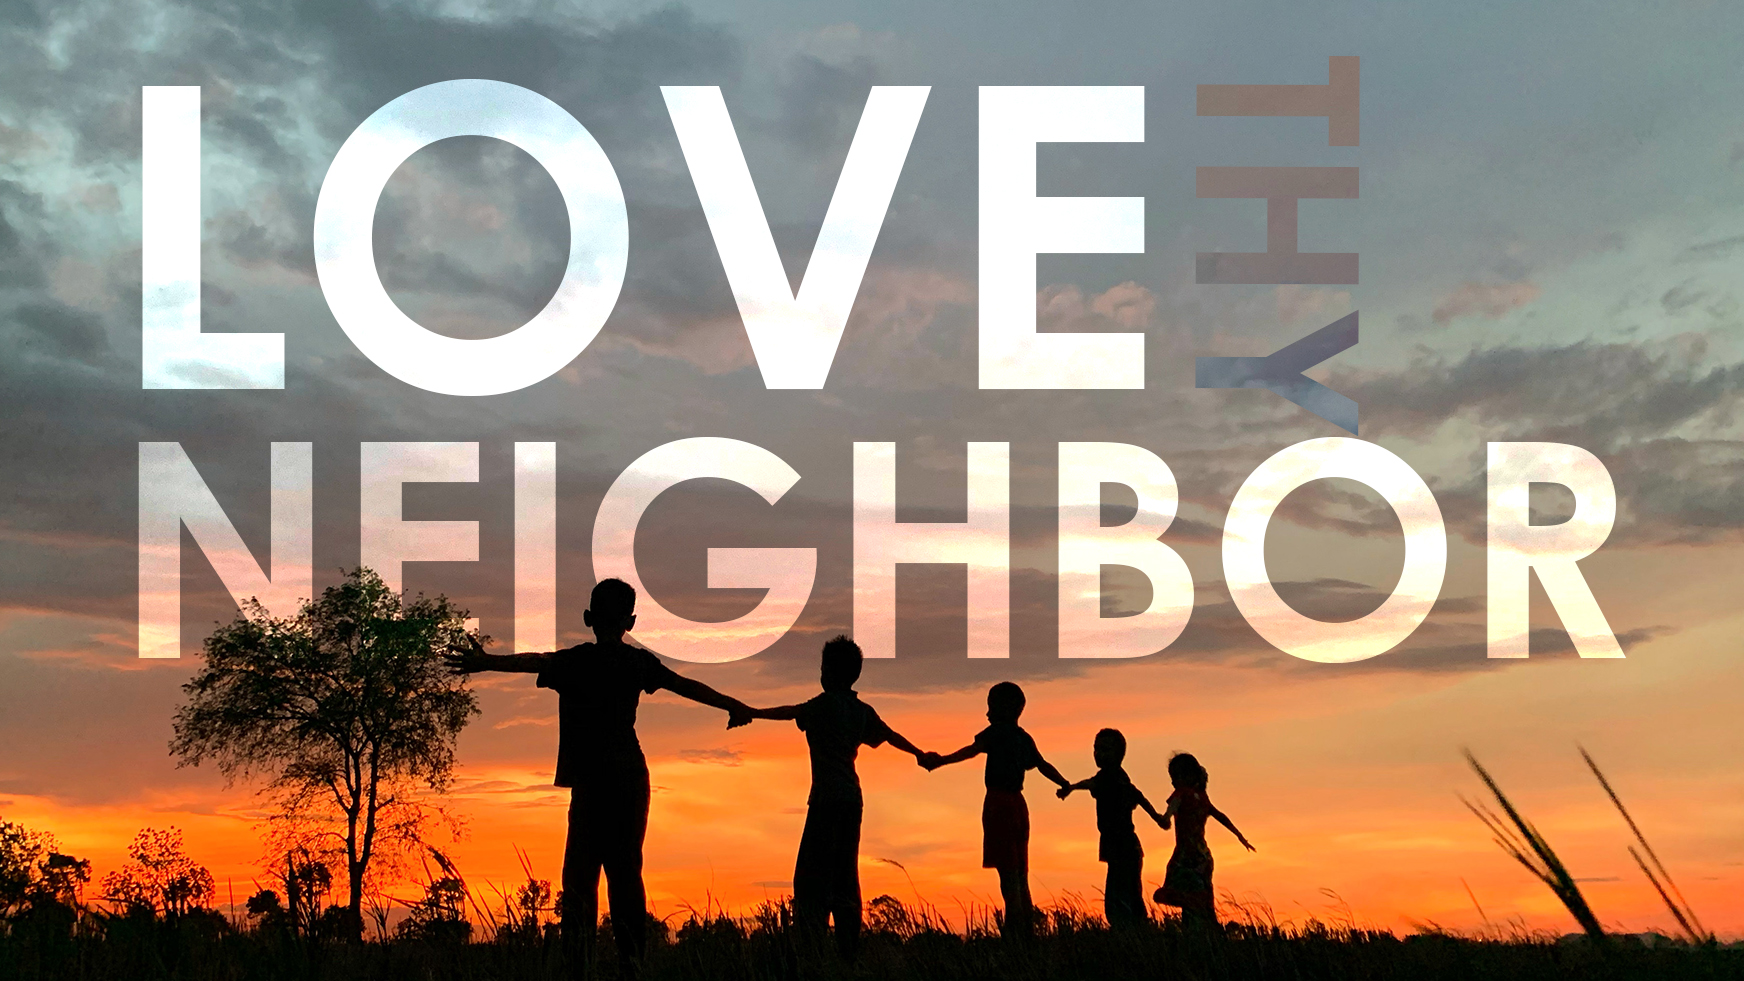 6-6-21 love thy neighbor 16-9